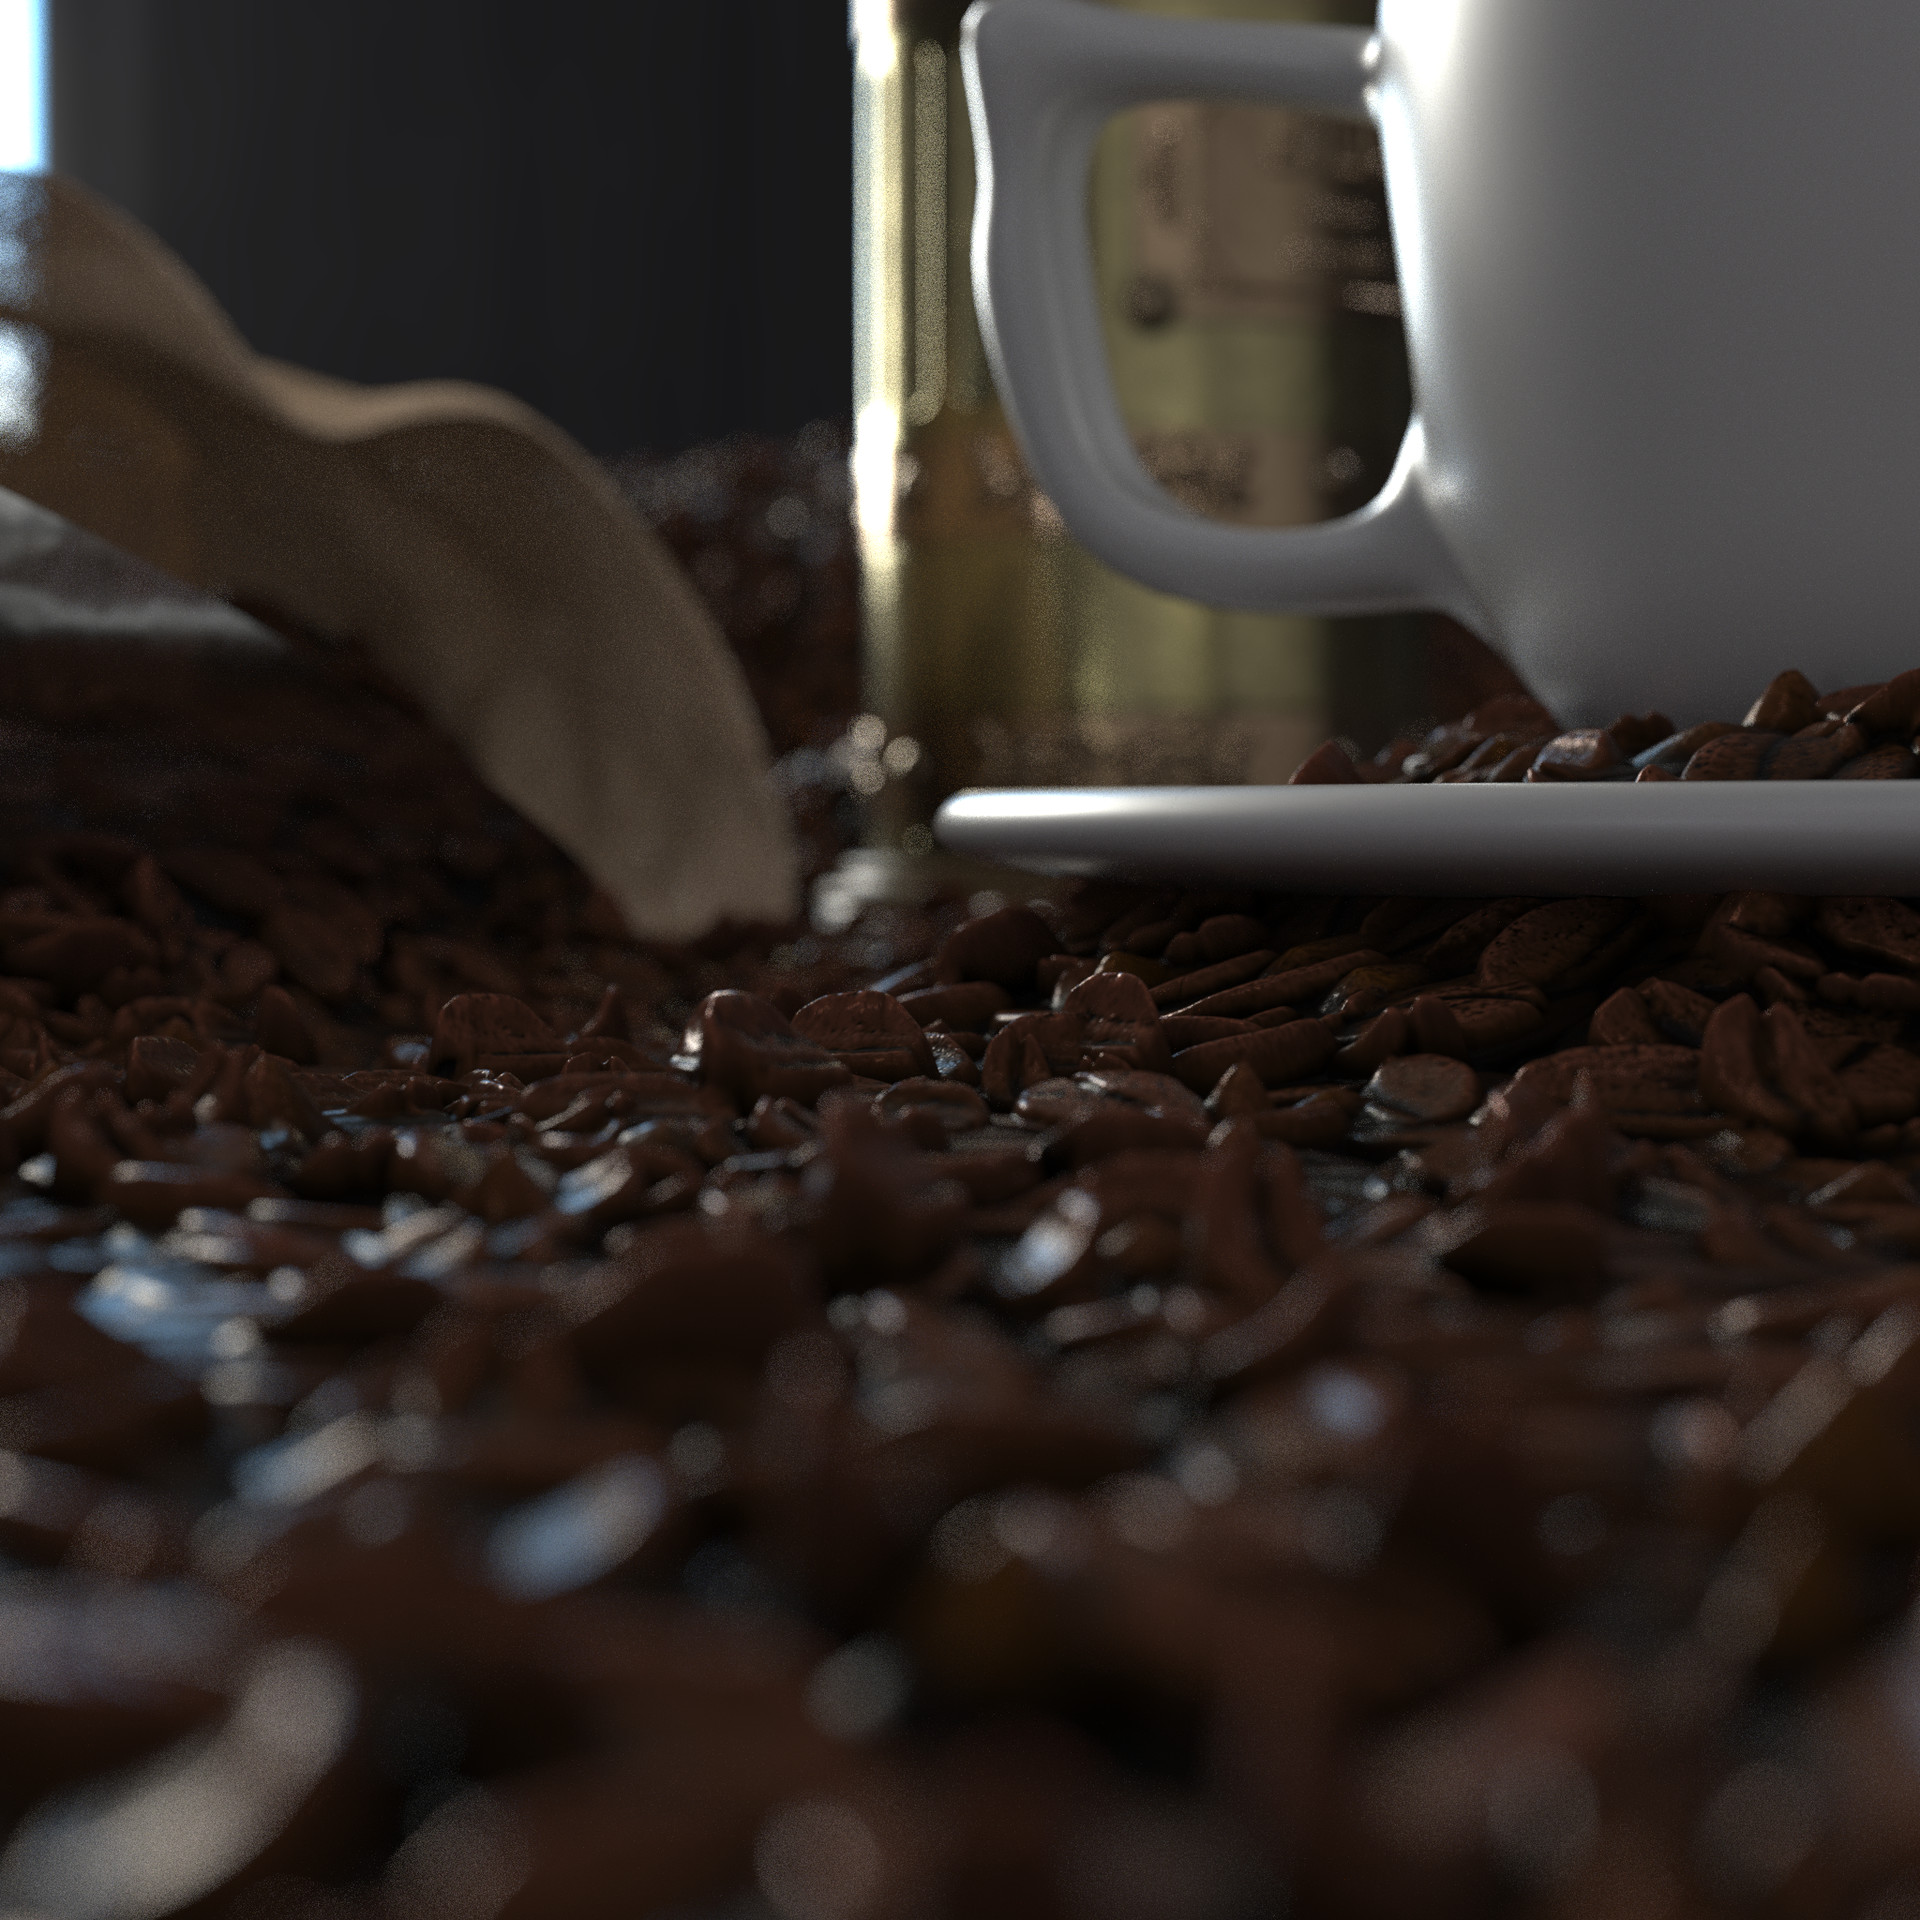 Cem tezcan anova coffee 00008